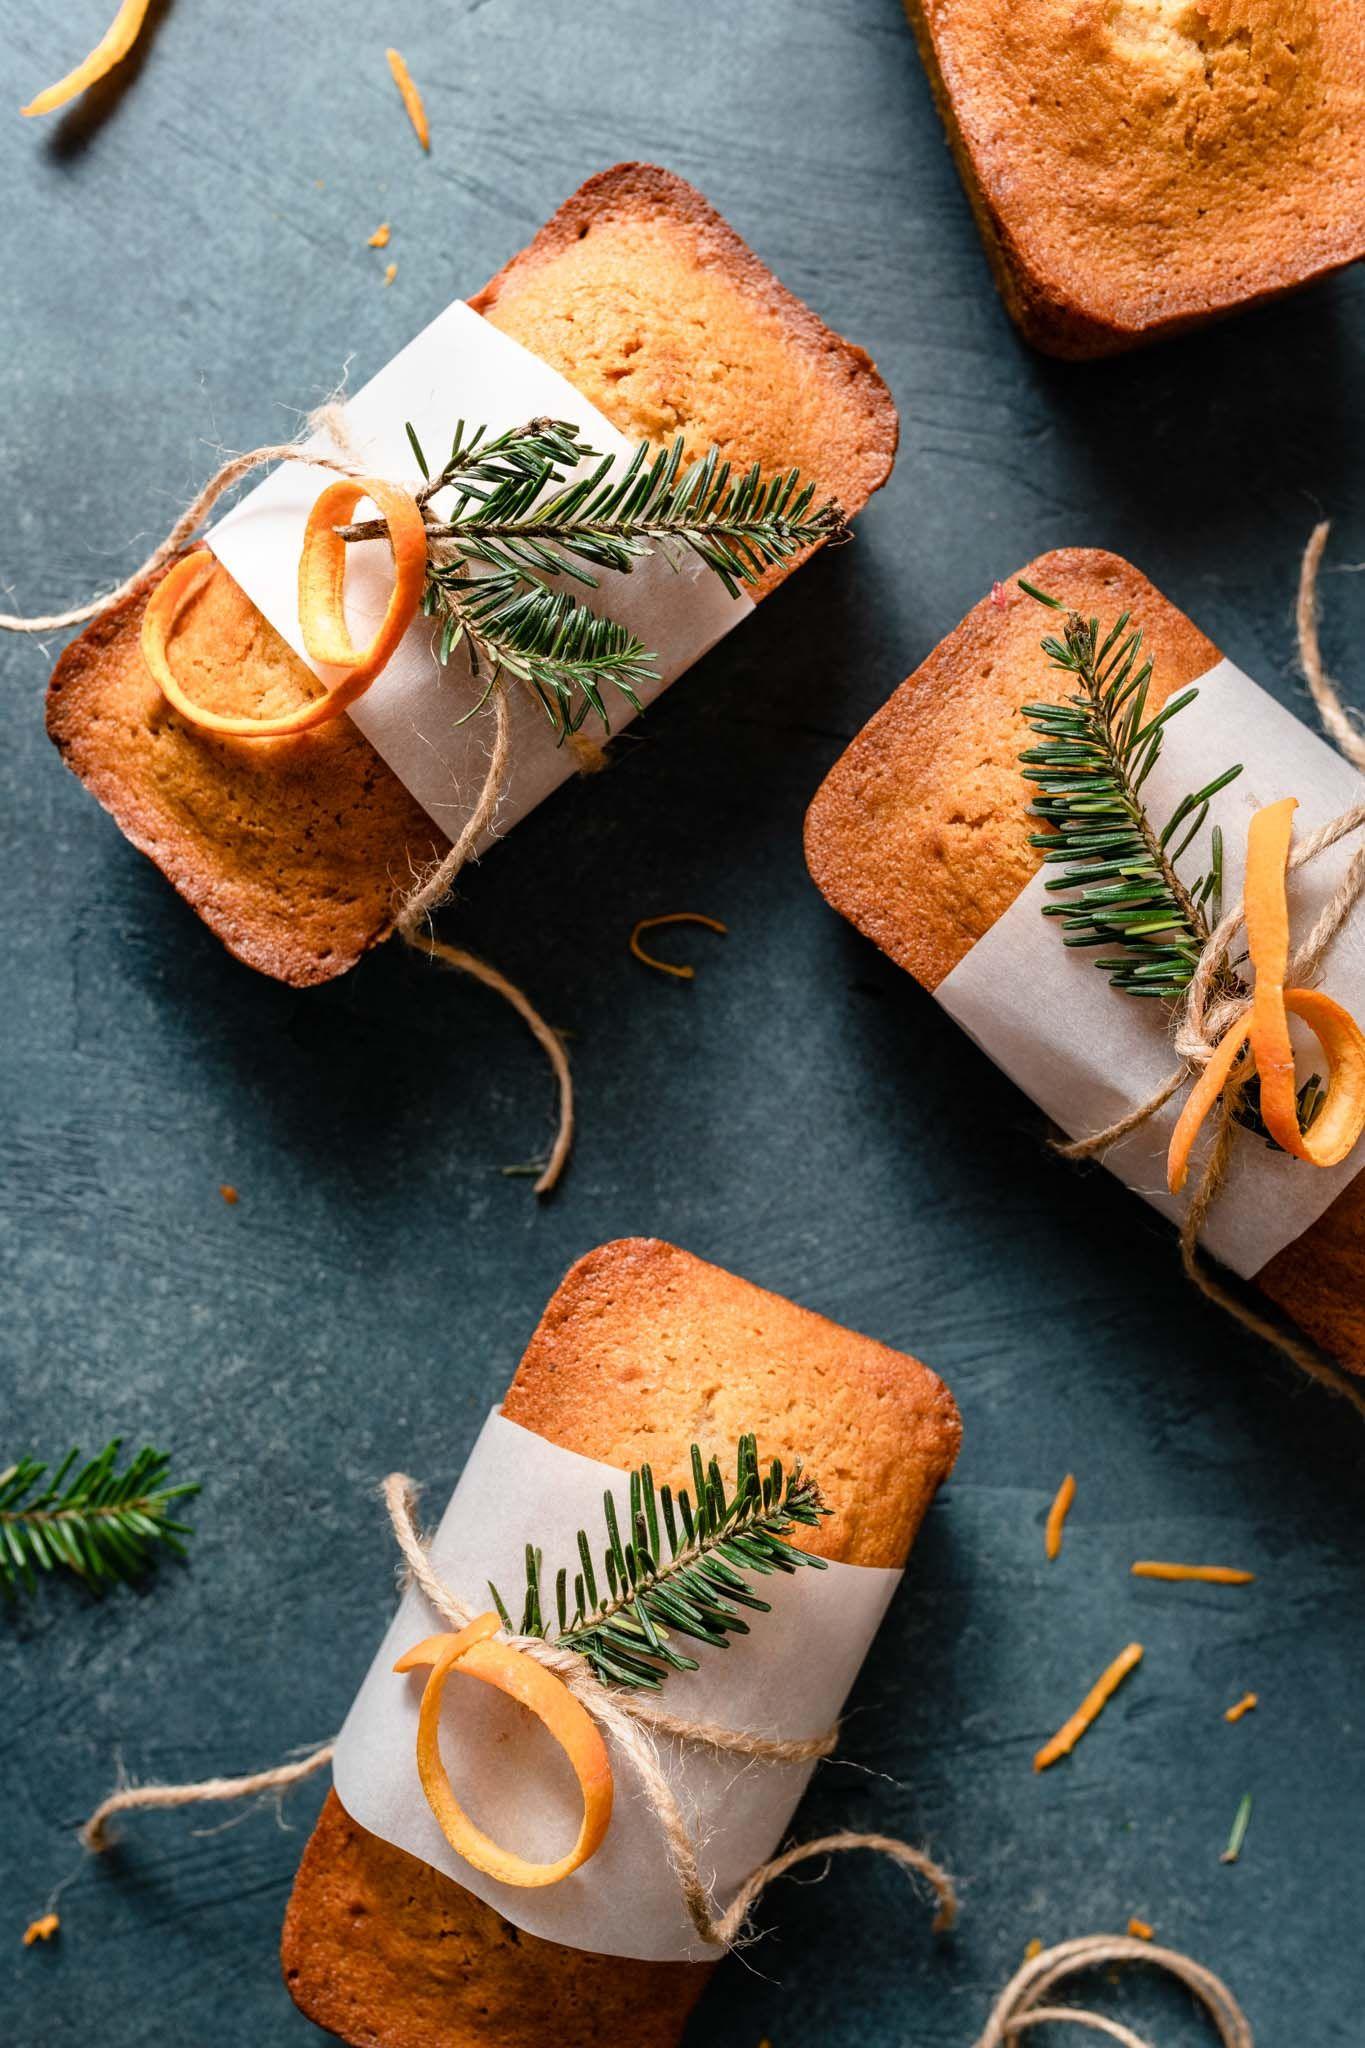 Orange Ginger Honey Cakes | Two Cups Flour